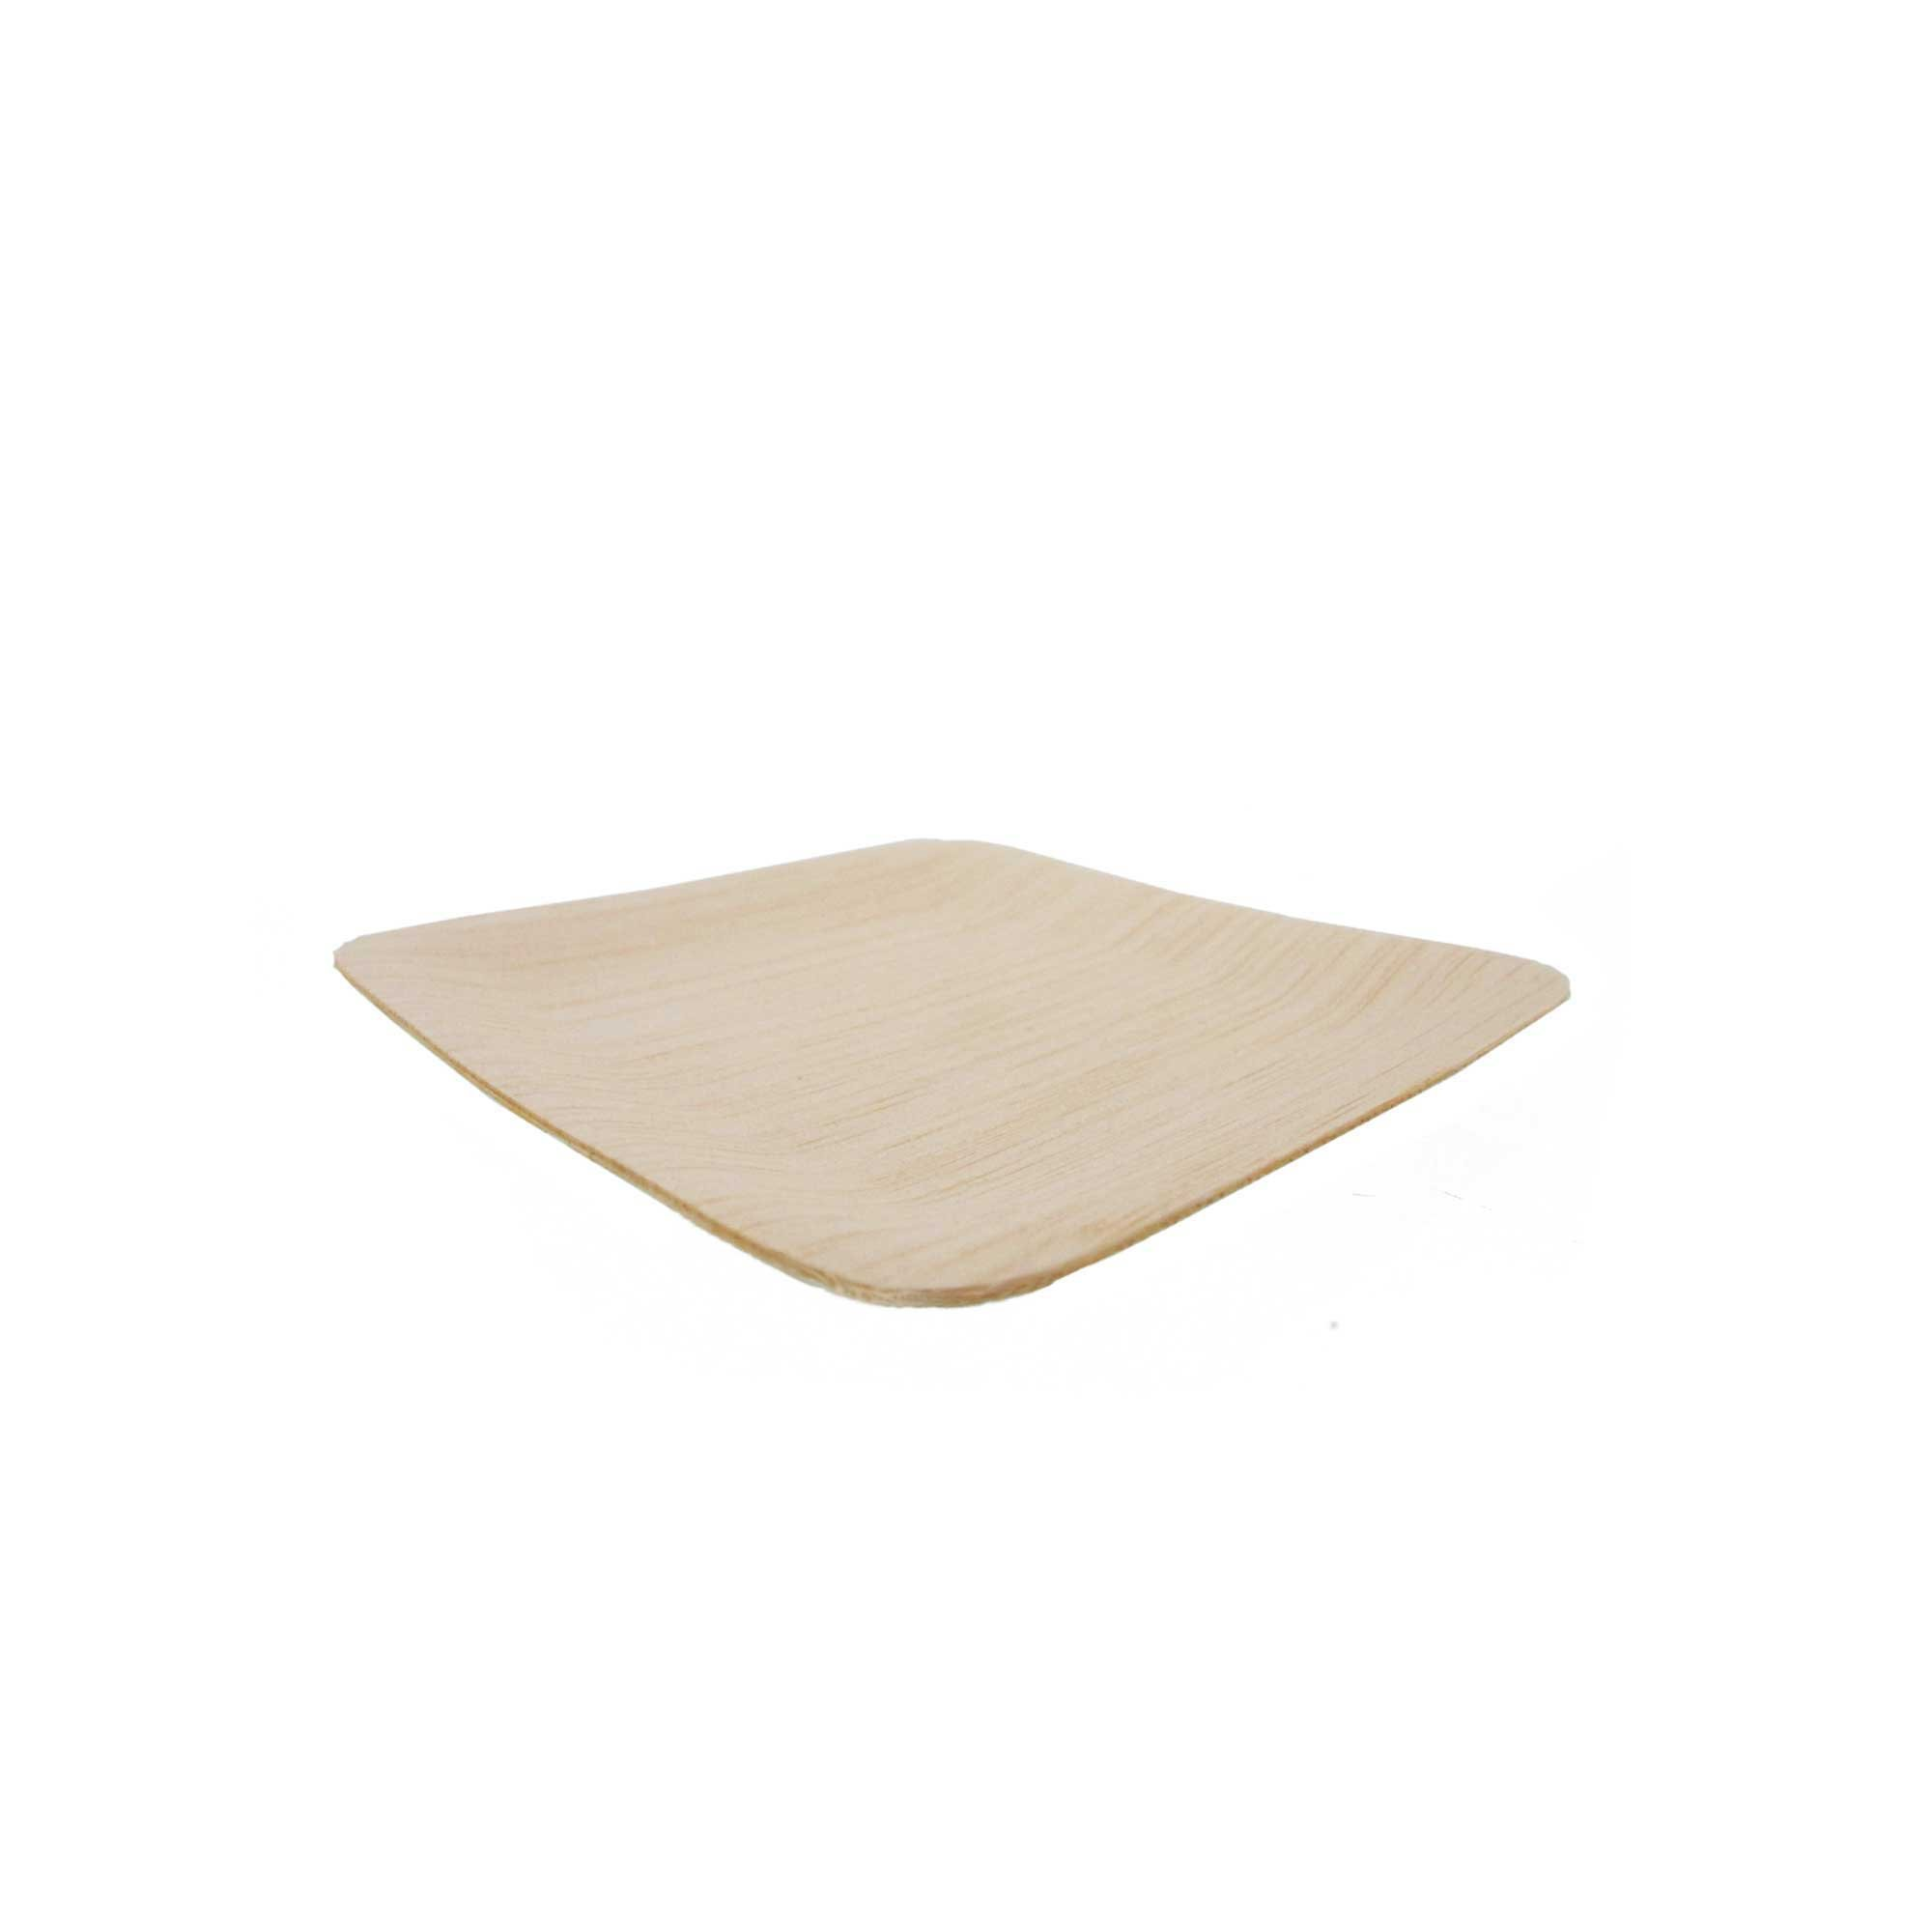 BambooMN Brand - 3.5'' (9cm) Square Disposable Bamboo Veneer Plates, 96pcs